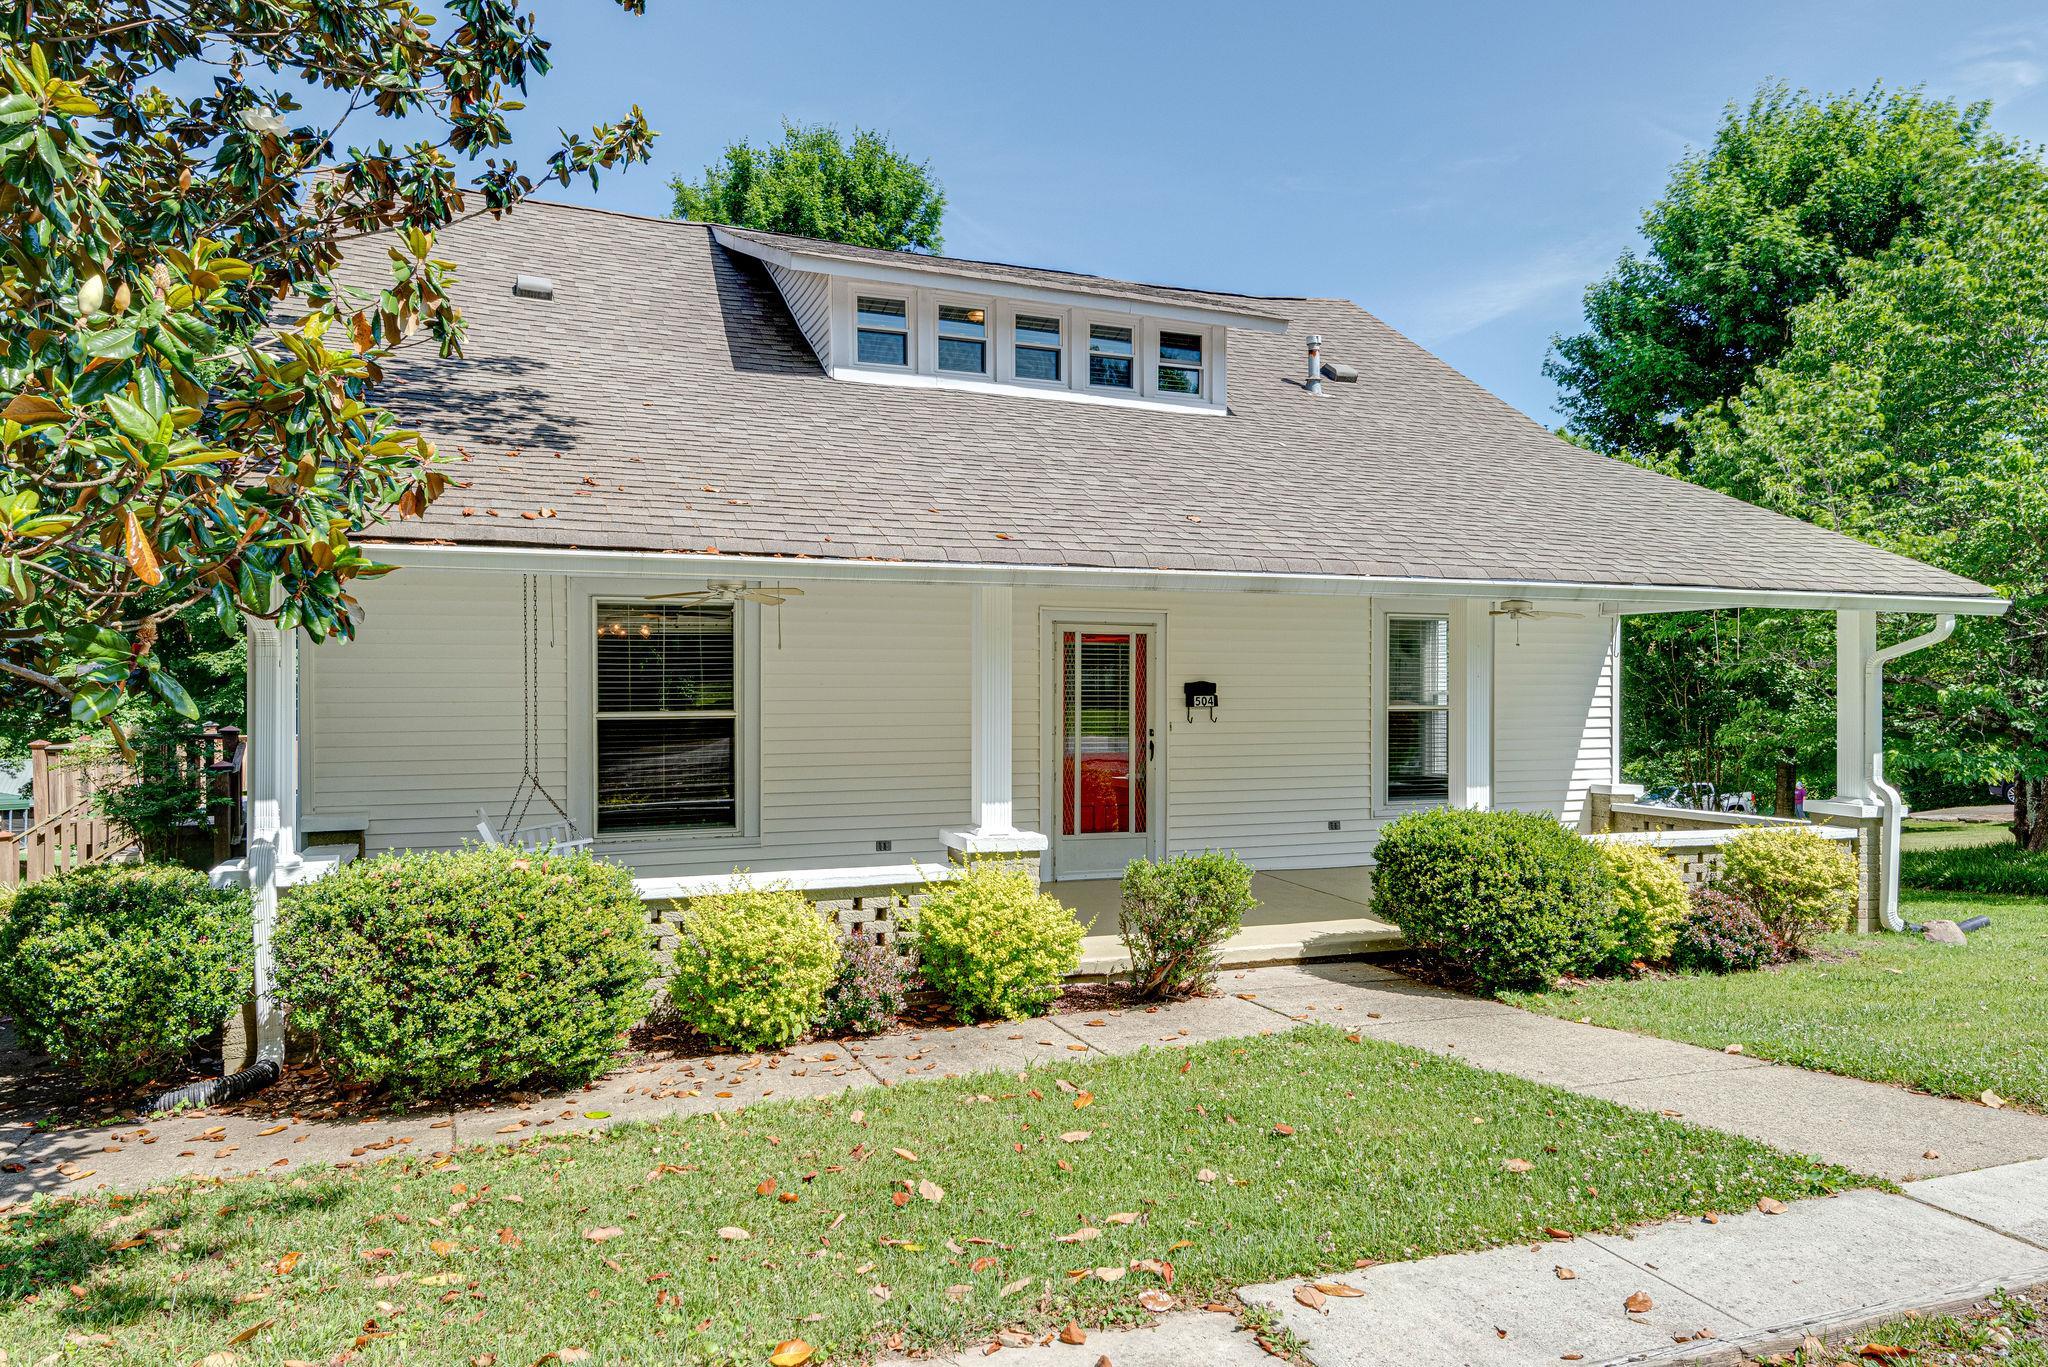 504 N Main St, Dickson, TN 37055 - Dickson, TN real estate listing